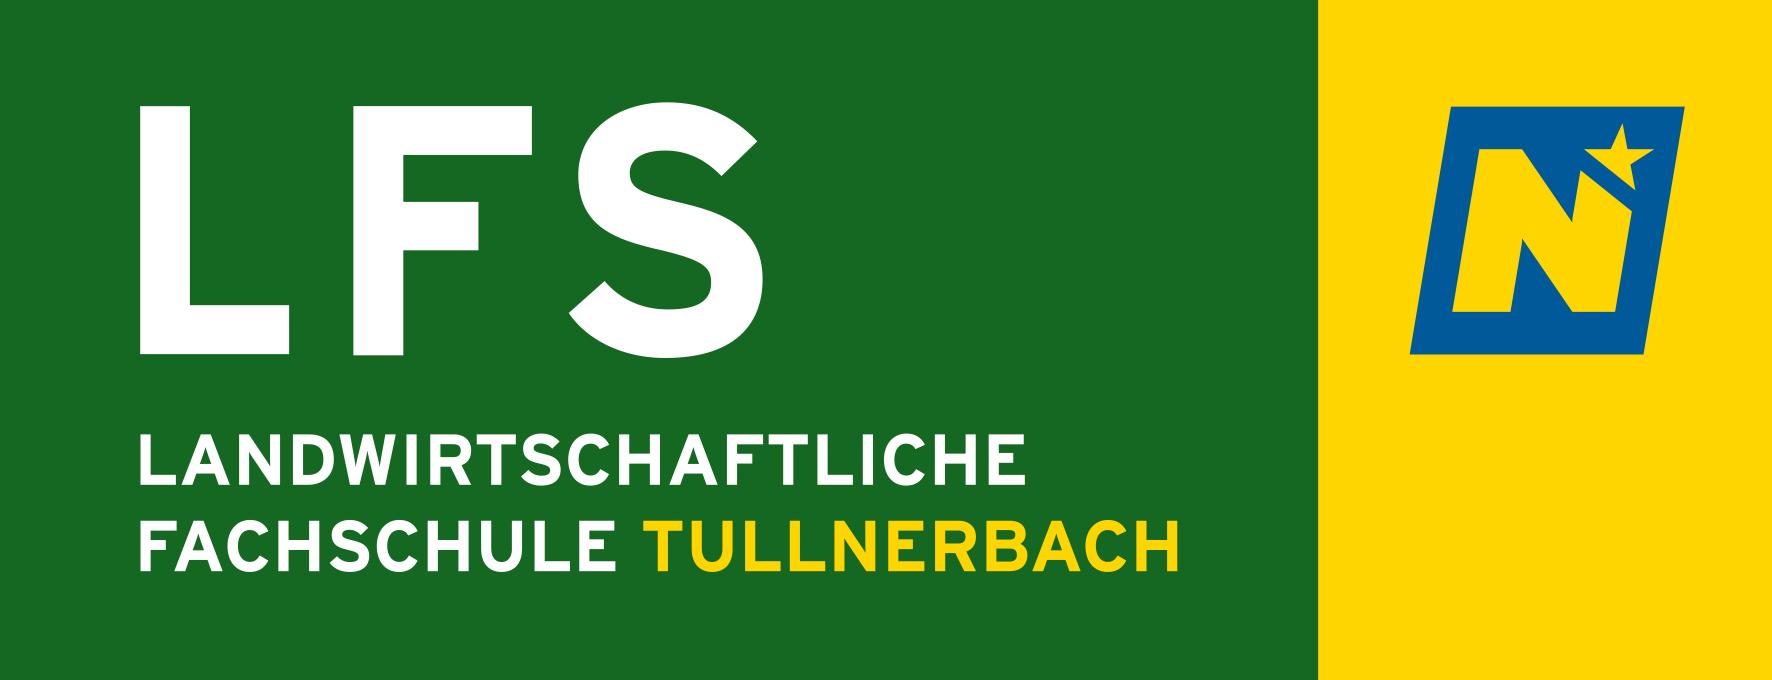 LFS Tullnerbach LOGO